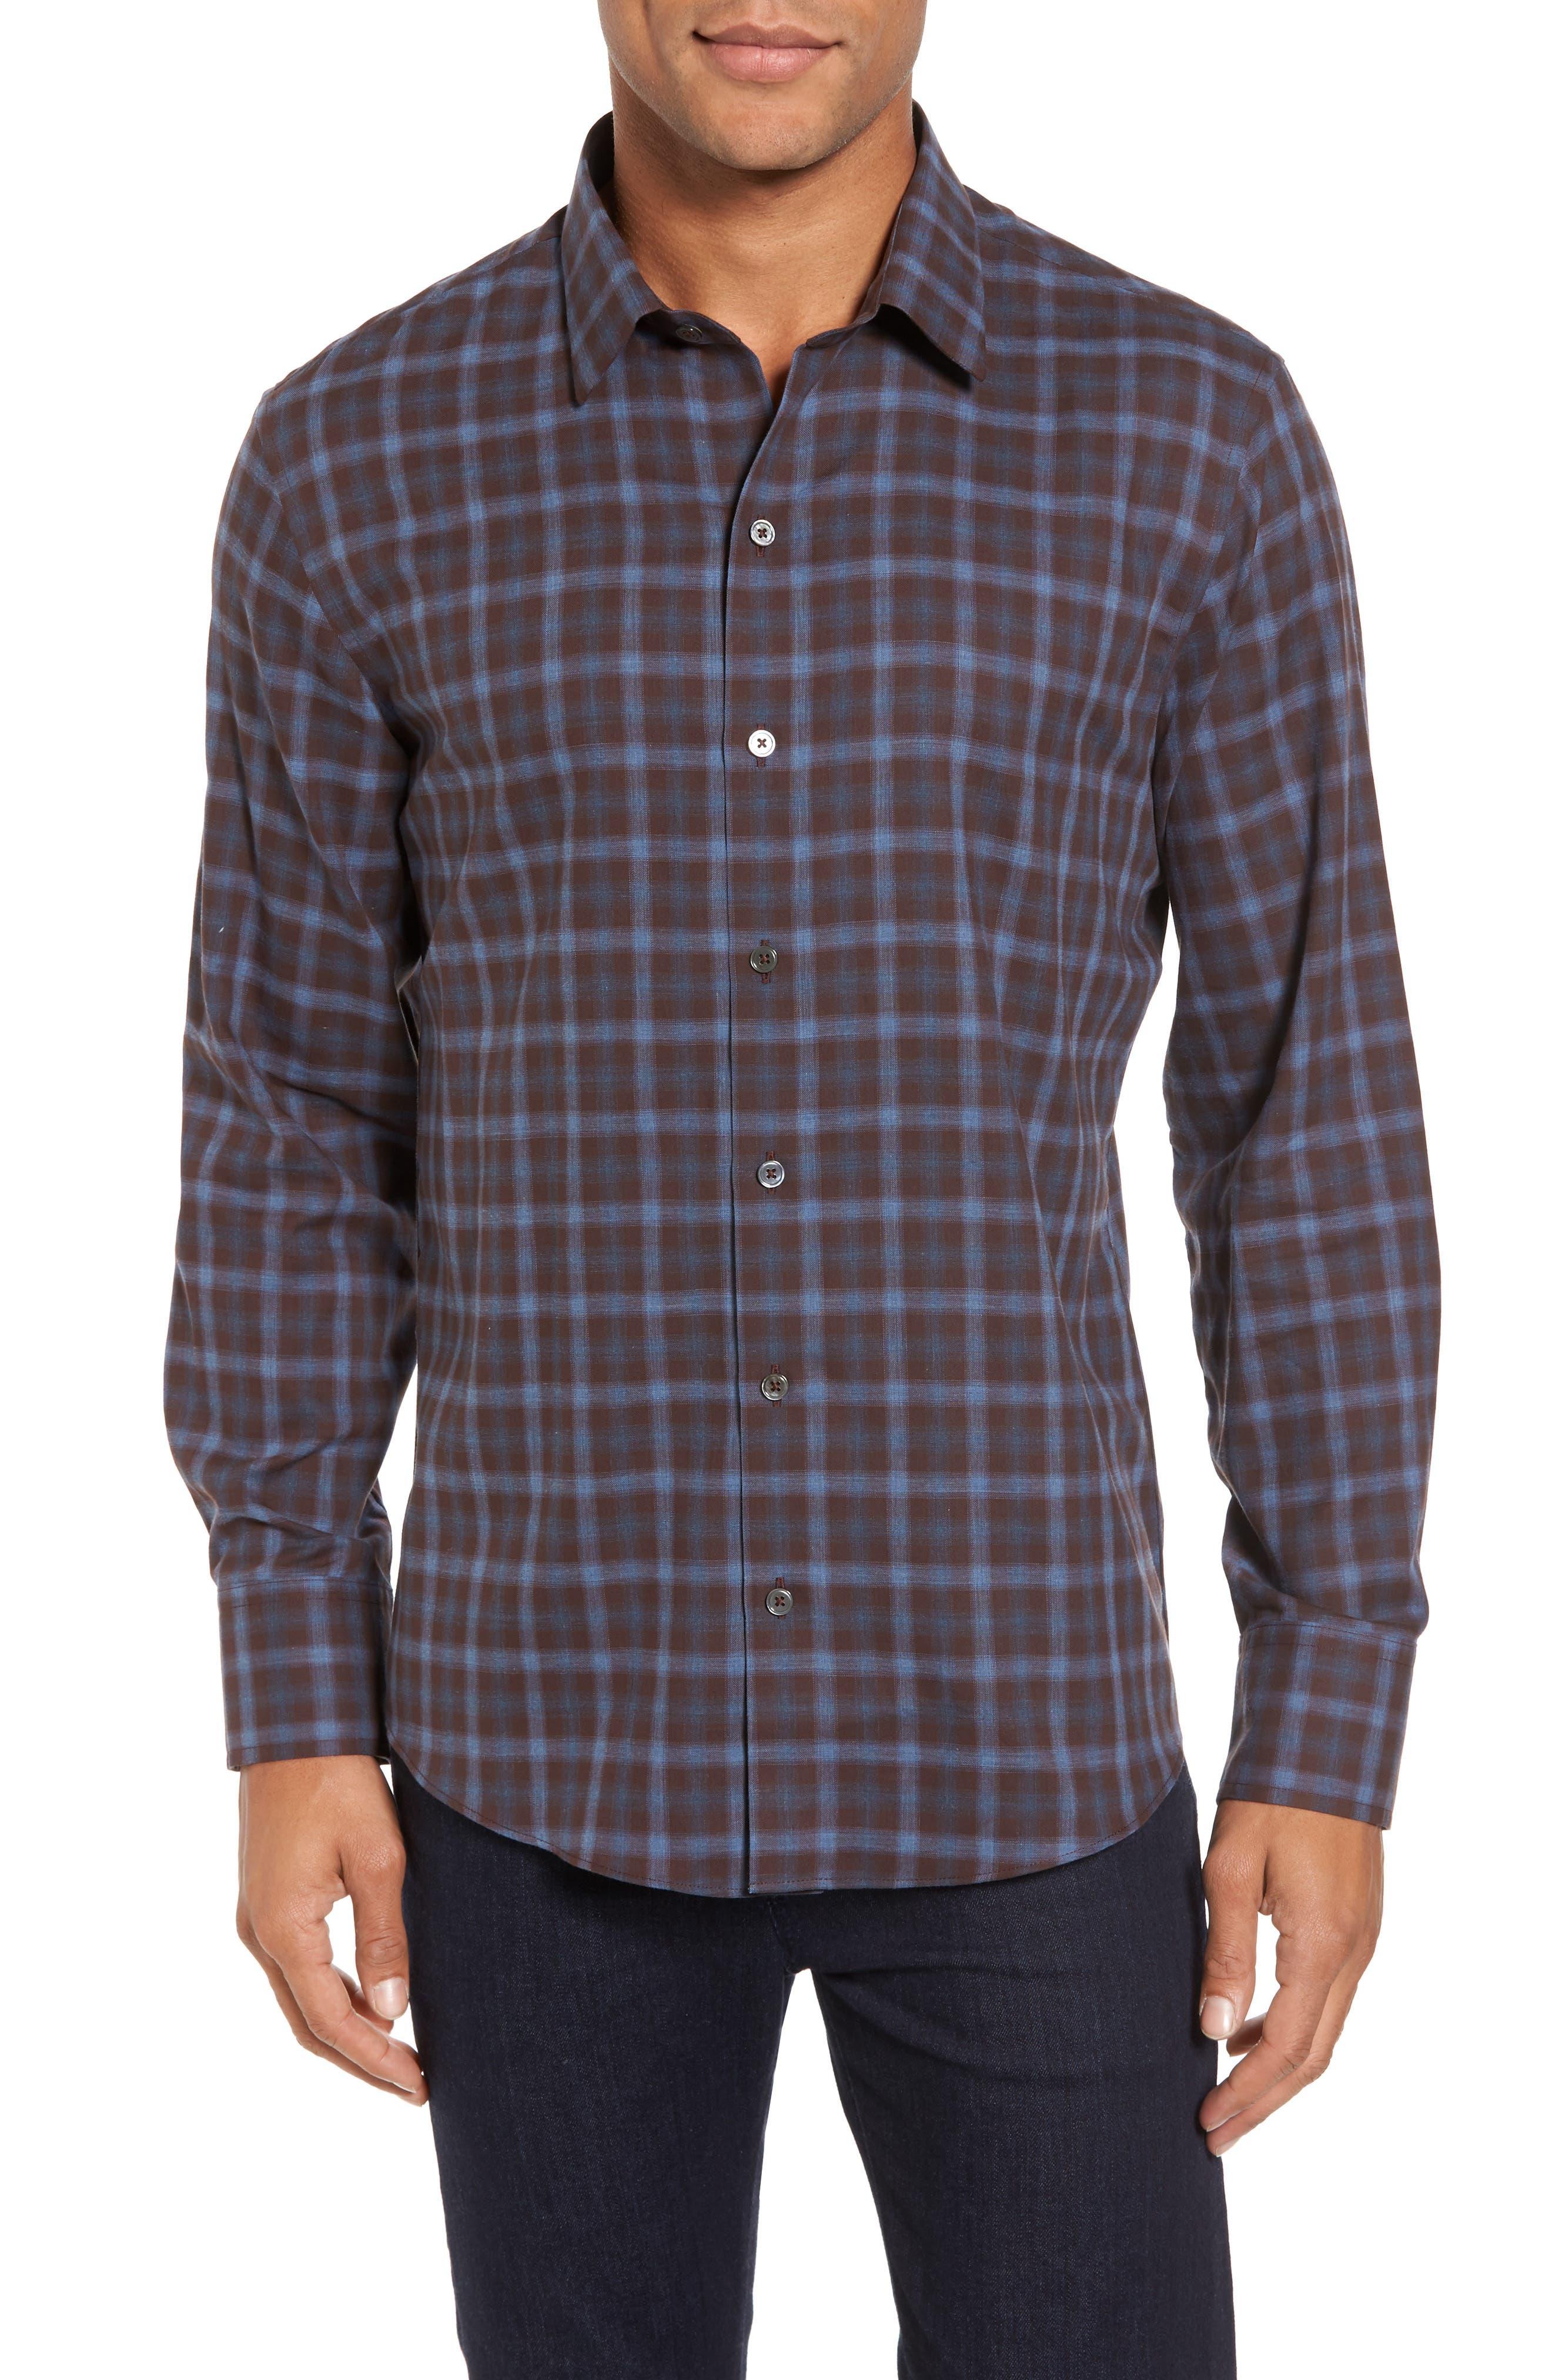 Fathollahi Slim Fit Plaid Sport Shirt,                             Main thumbnail 1, color,                             200